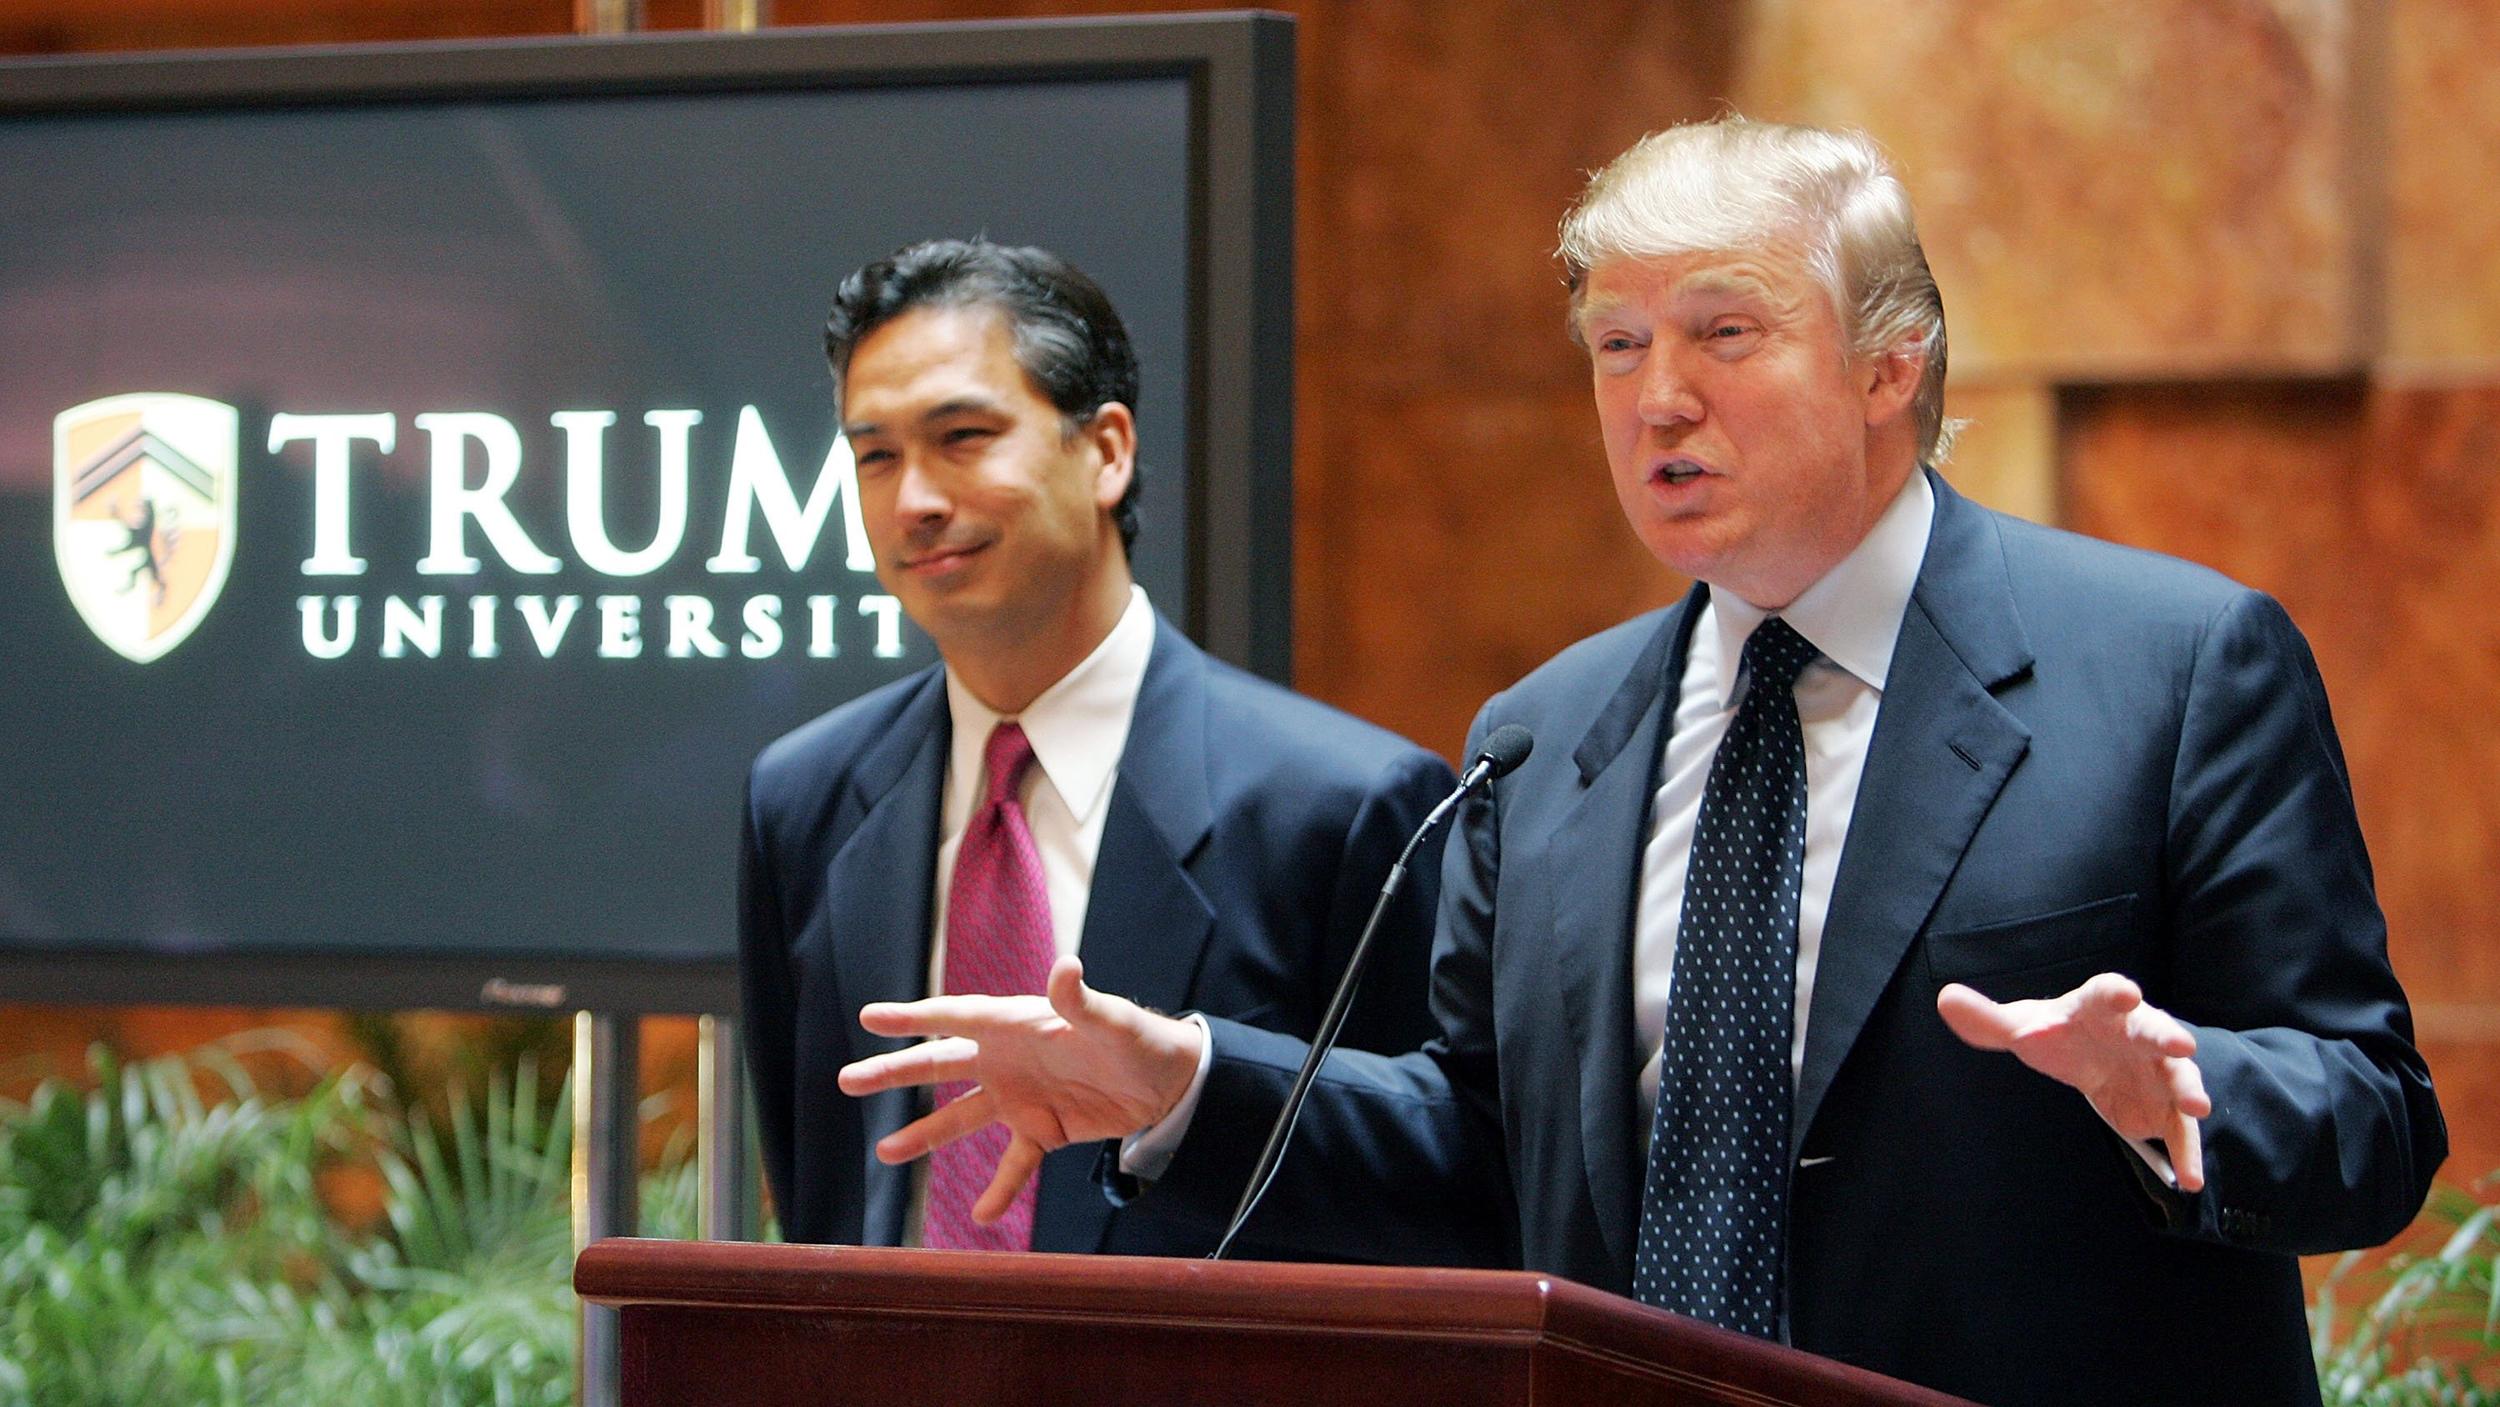 Trump University Settlement